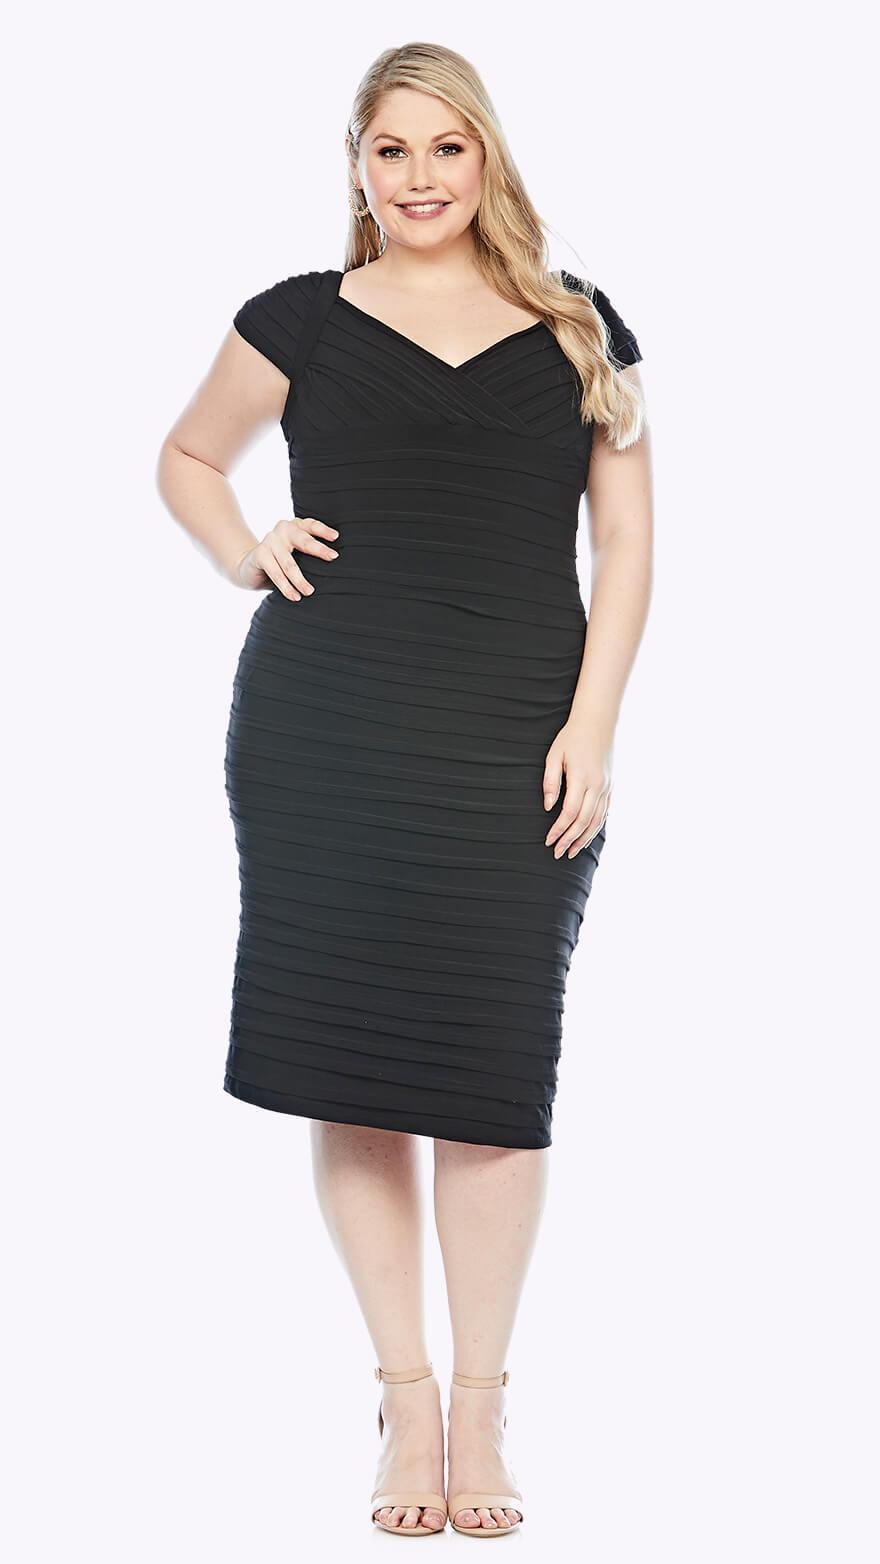 LJ0392 Knee-length bandage dress with cap sleeve and V neckline